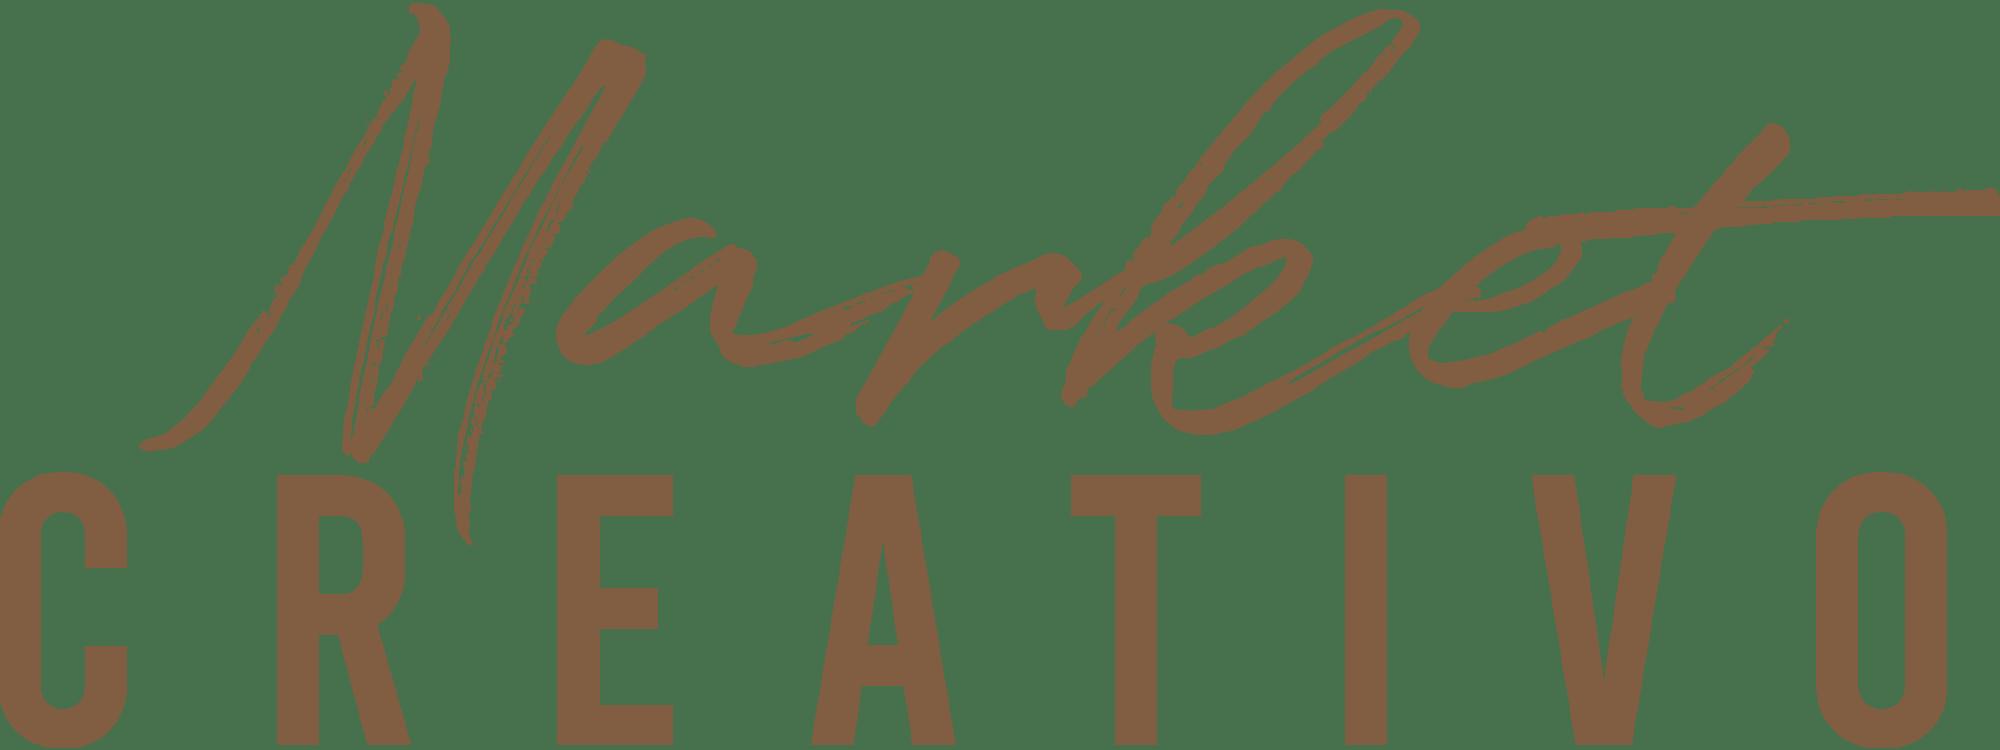 Logo-Market-Creativo-CAFE-flat-1